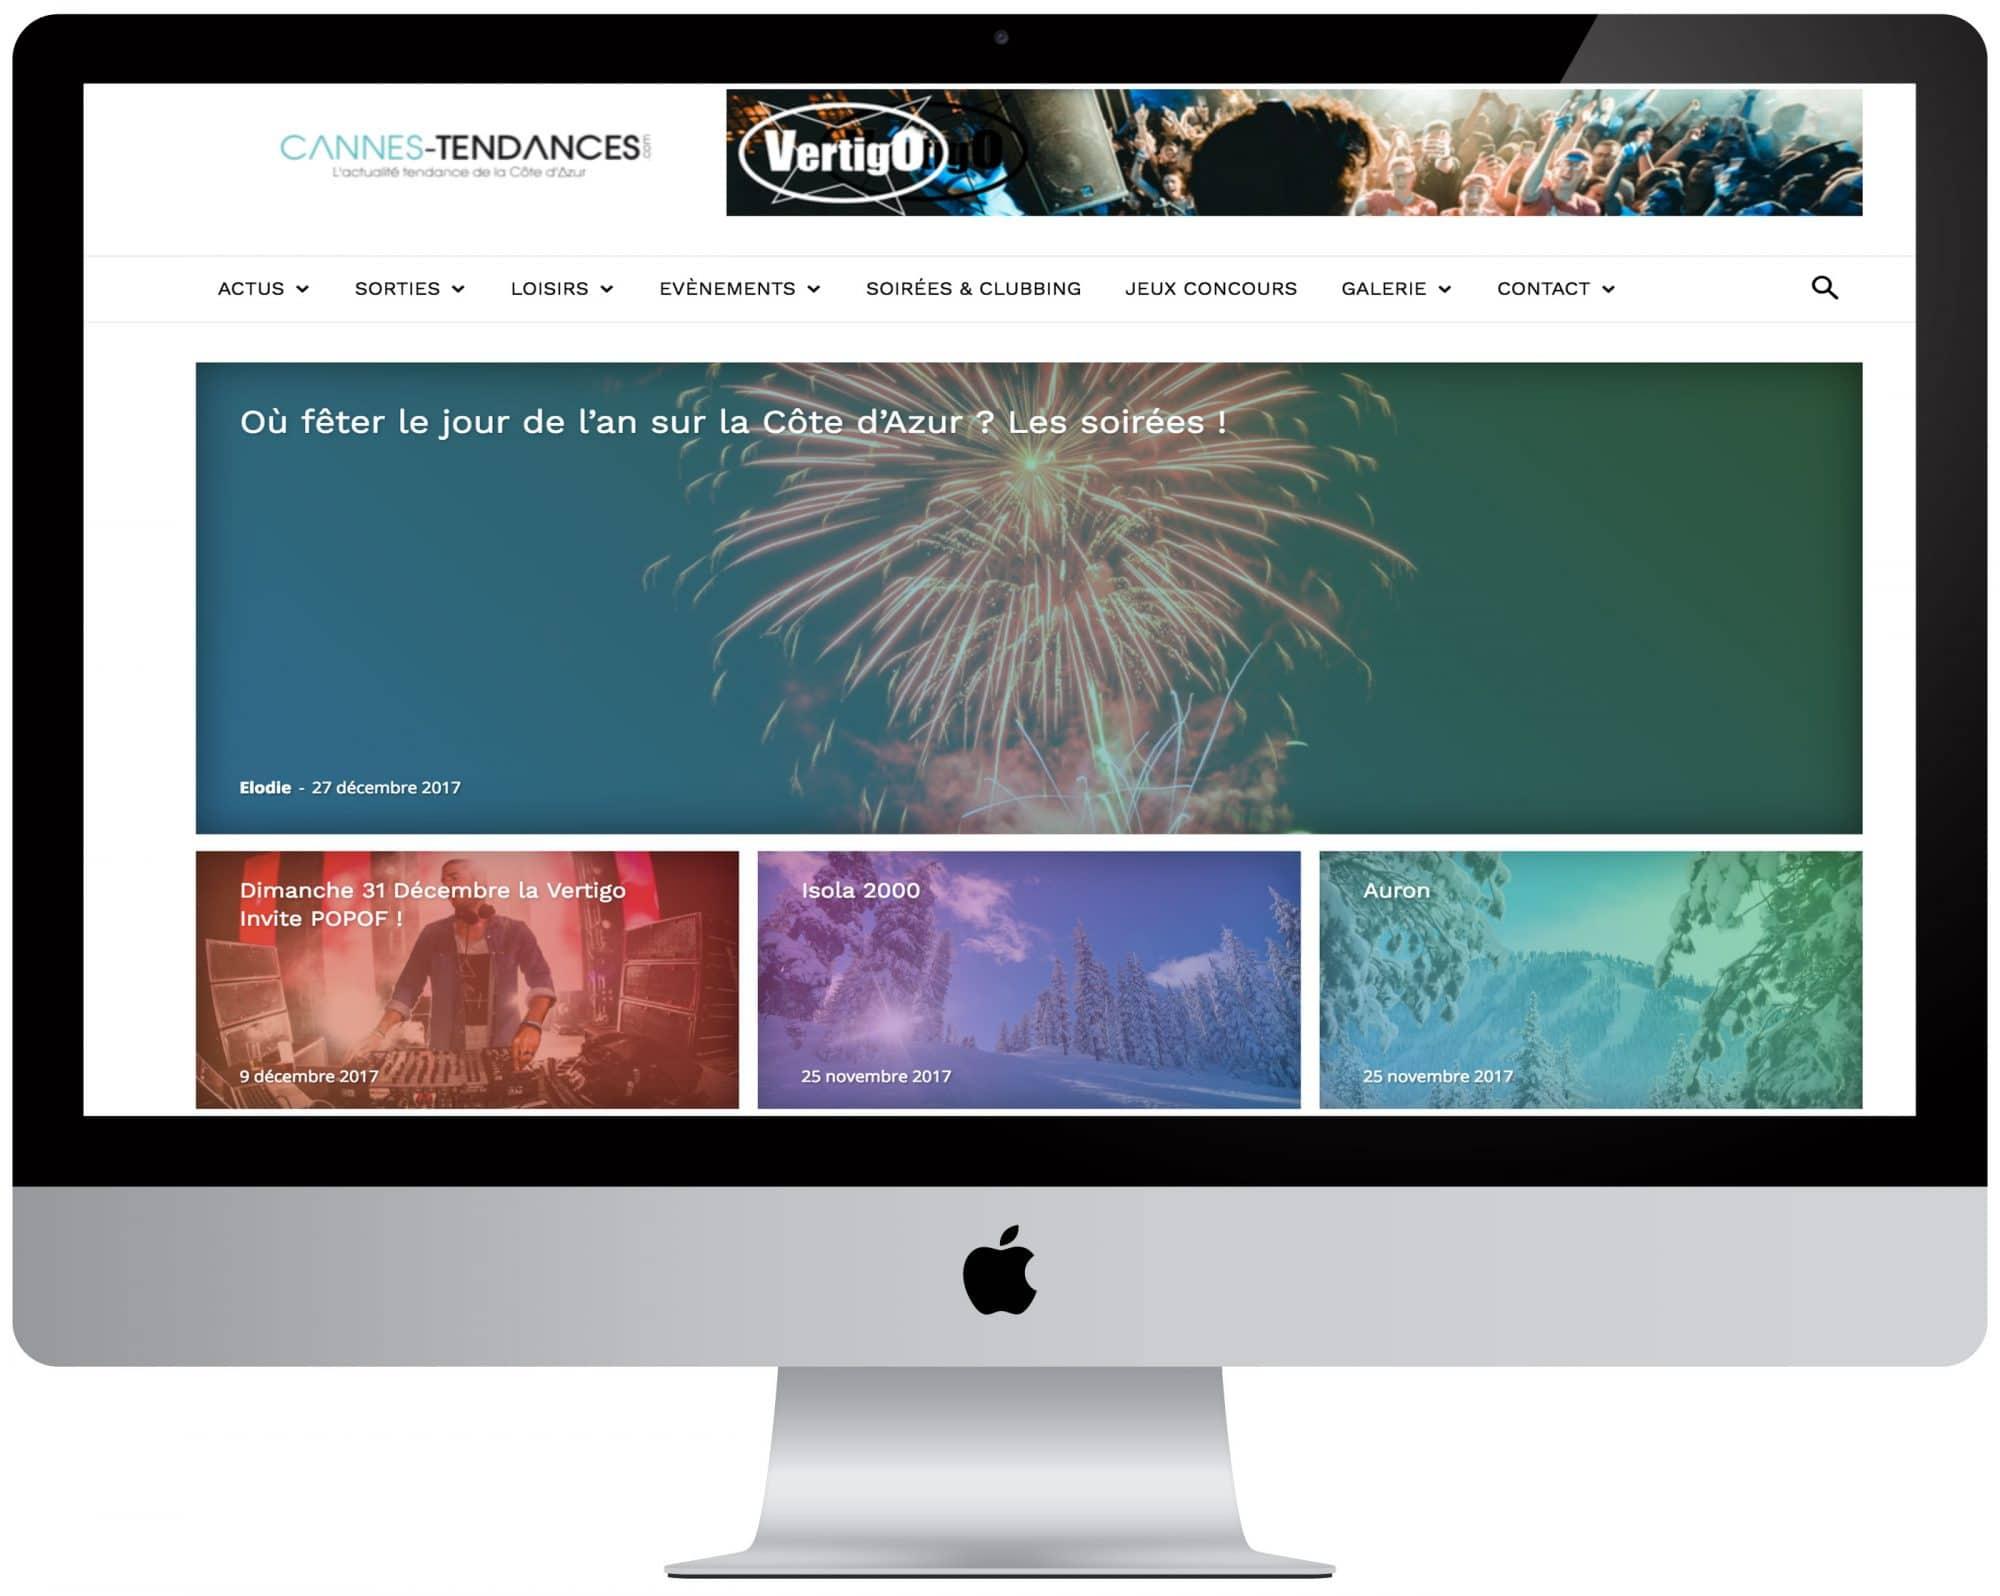 webmaster nice webmaster freelance webmaster monaco creation site web nice webmaster pas cher recherche webmaster pour site agence web nice recherche webmaster pas cher